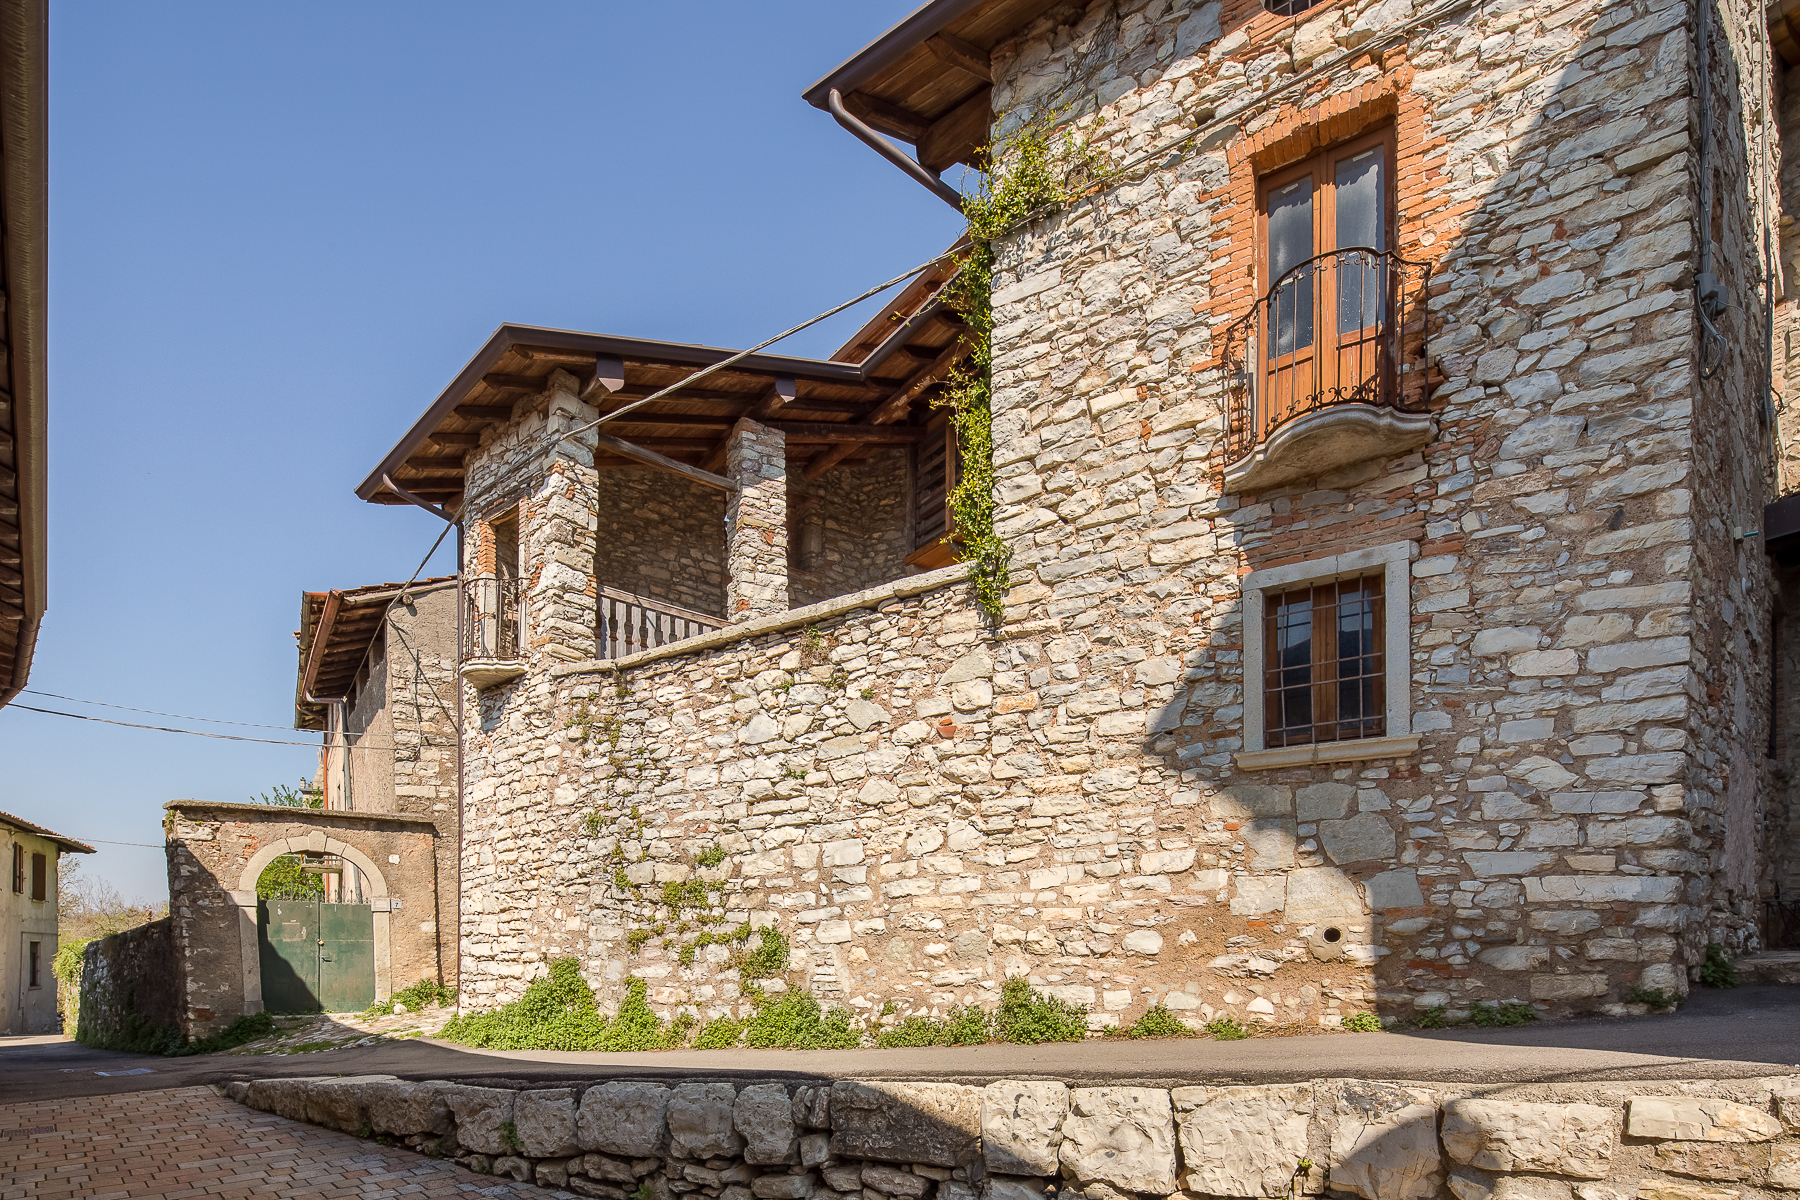 Casa indipendente in Vendita a Caprino Bergamasco:  5 locali, 500 mq  - Foto 1